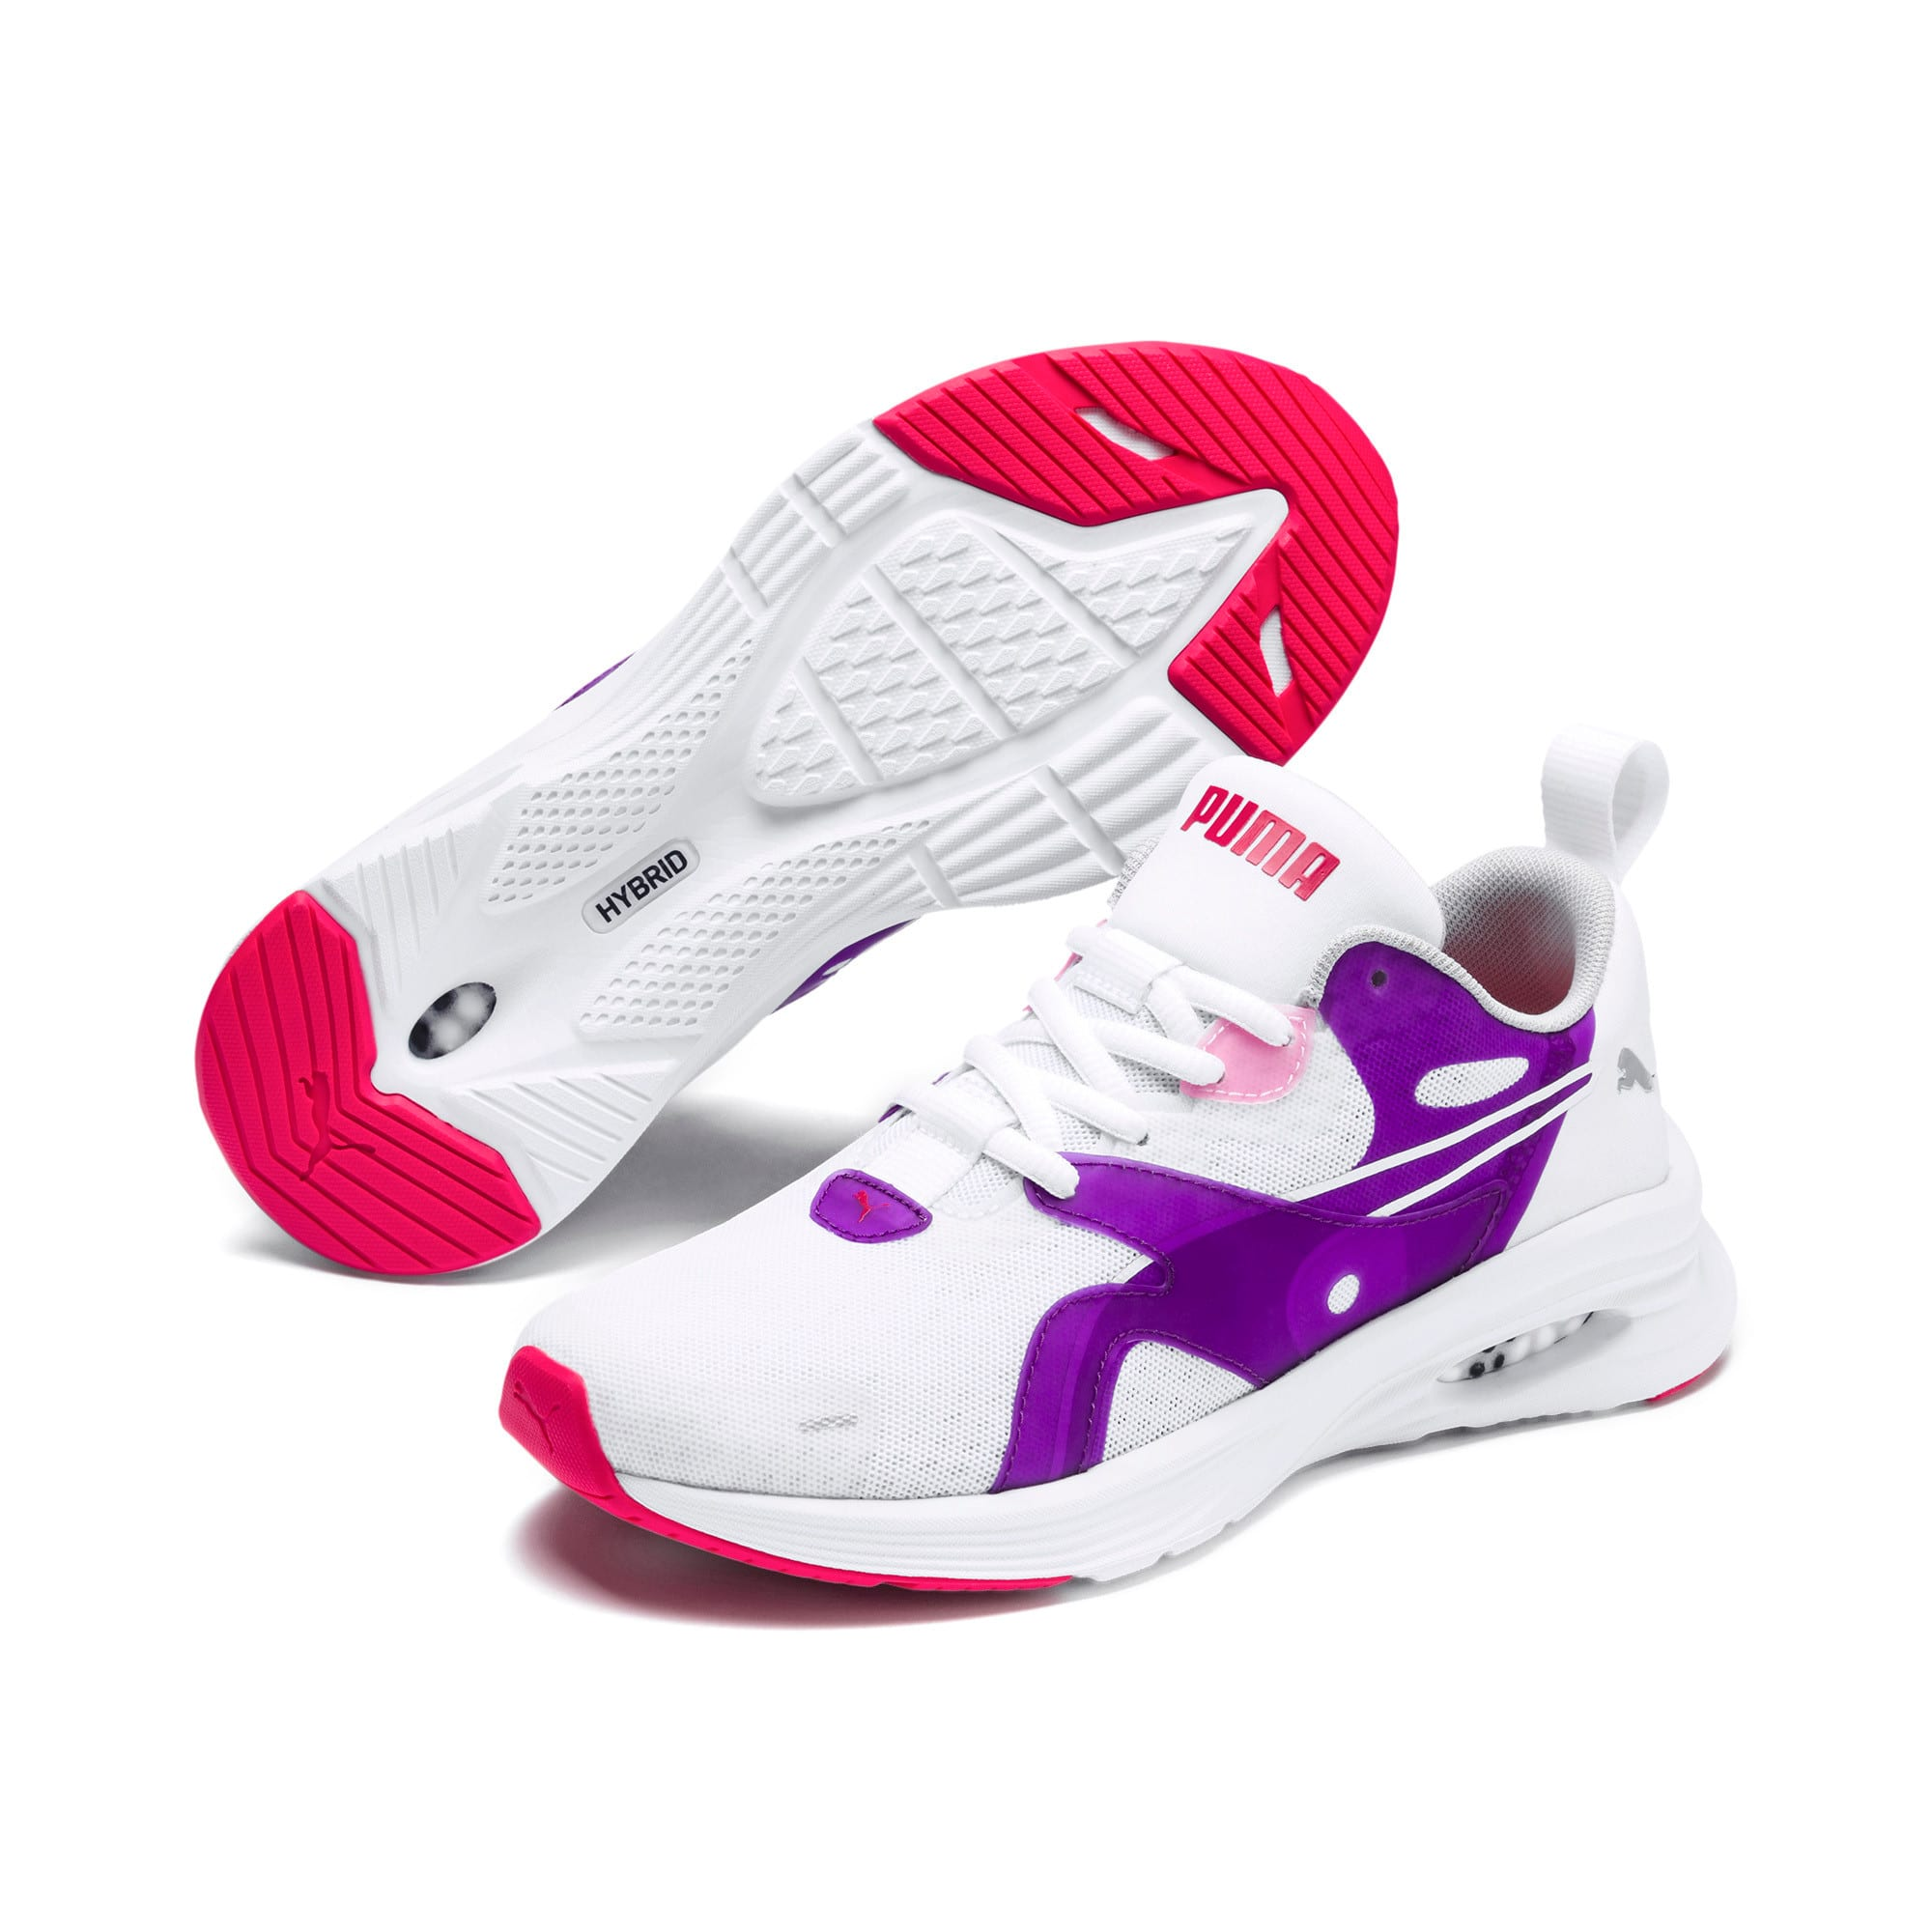 Thumbnail 2 of HYBRID Fuego Running Shoes JR, Puma White-Royal Lilac, medium